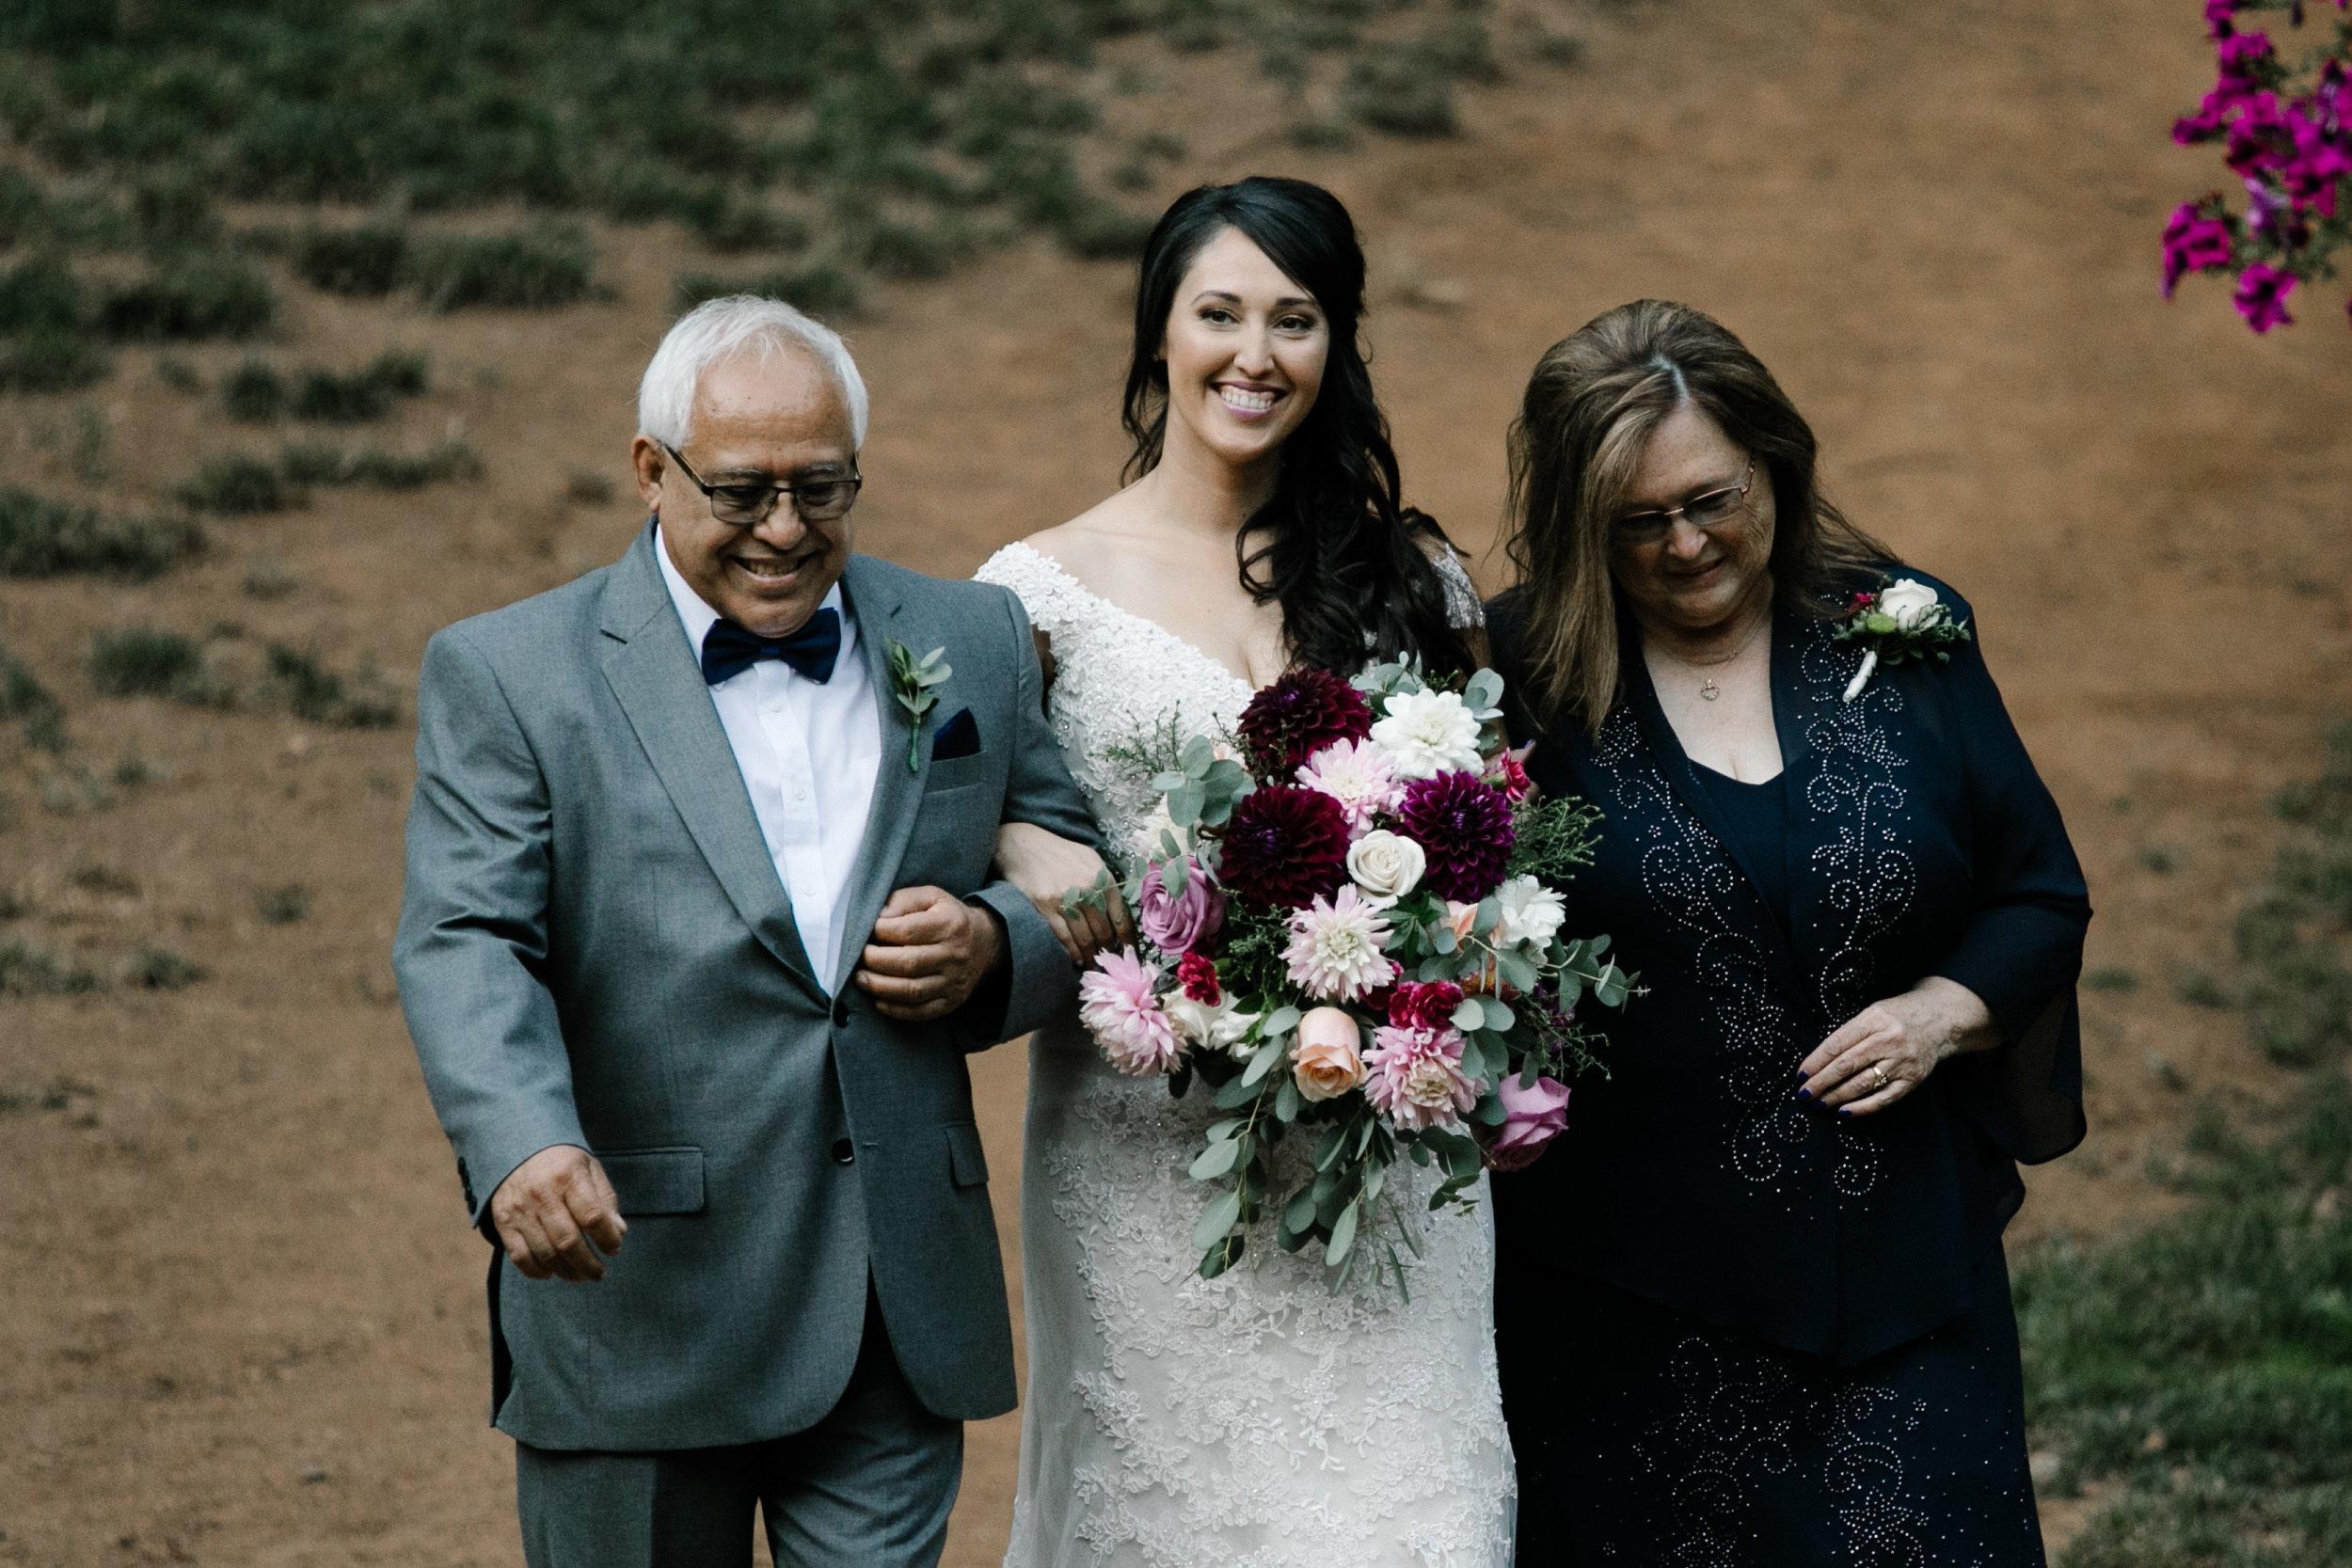 Sevlynn-Photography-Teresa-Chandler-Wedding-49.jpg